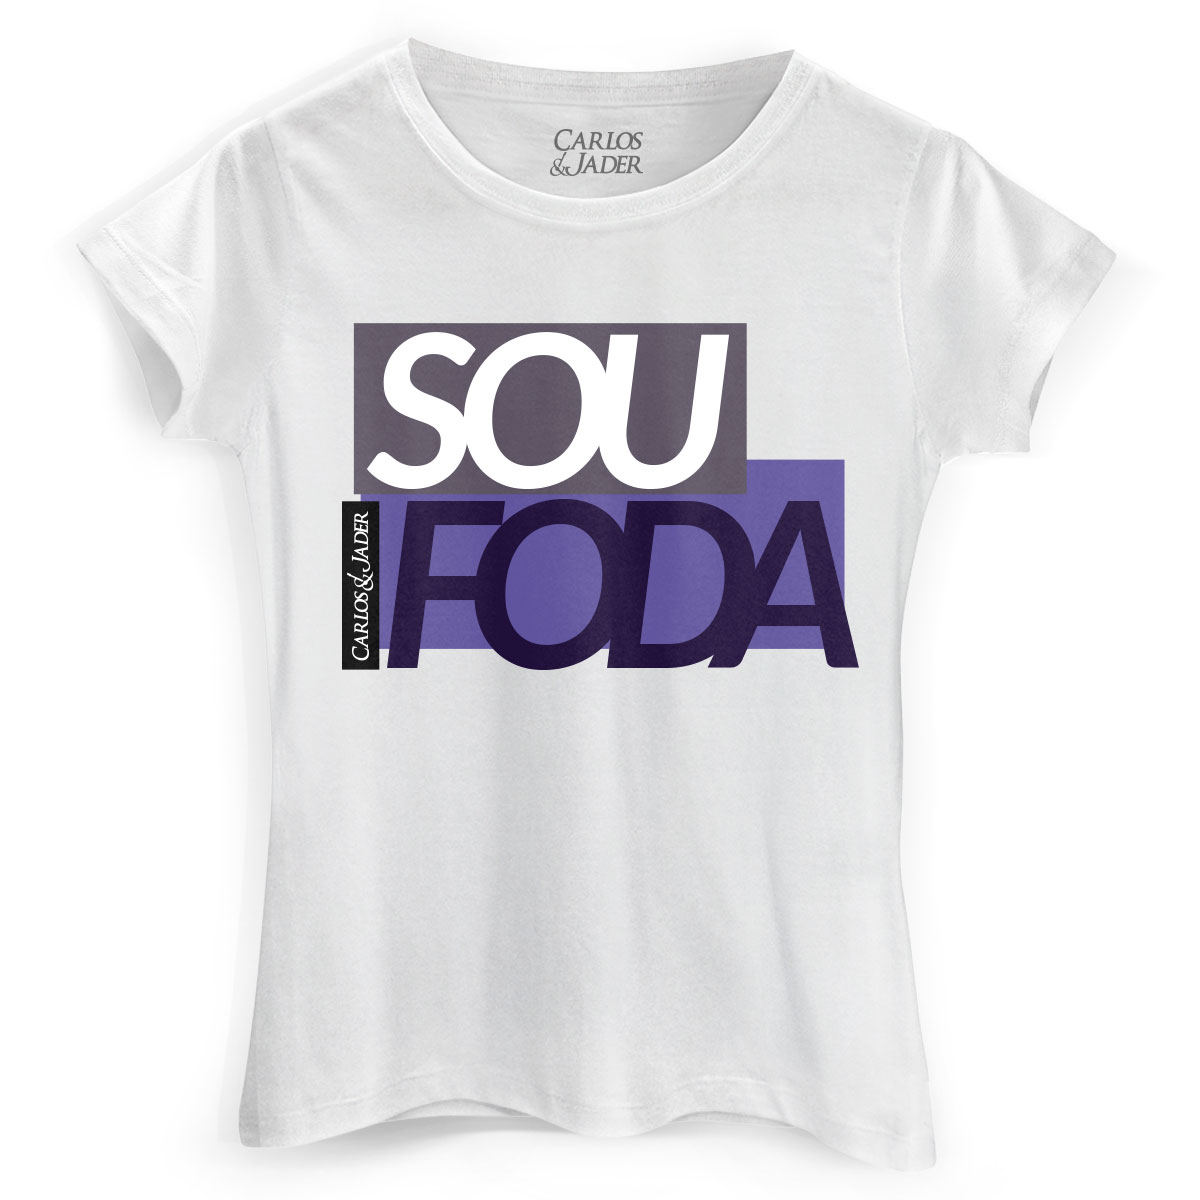 Camiseta Feminina Carlos e Jader Sou Foda